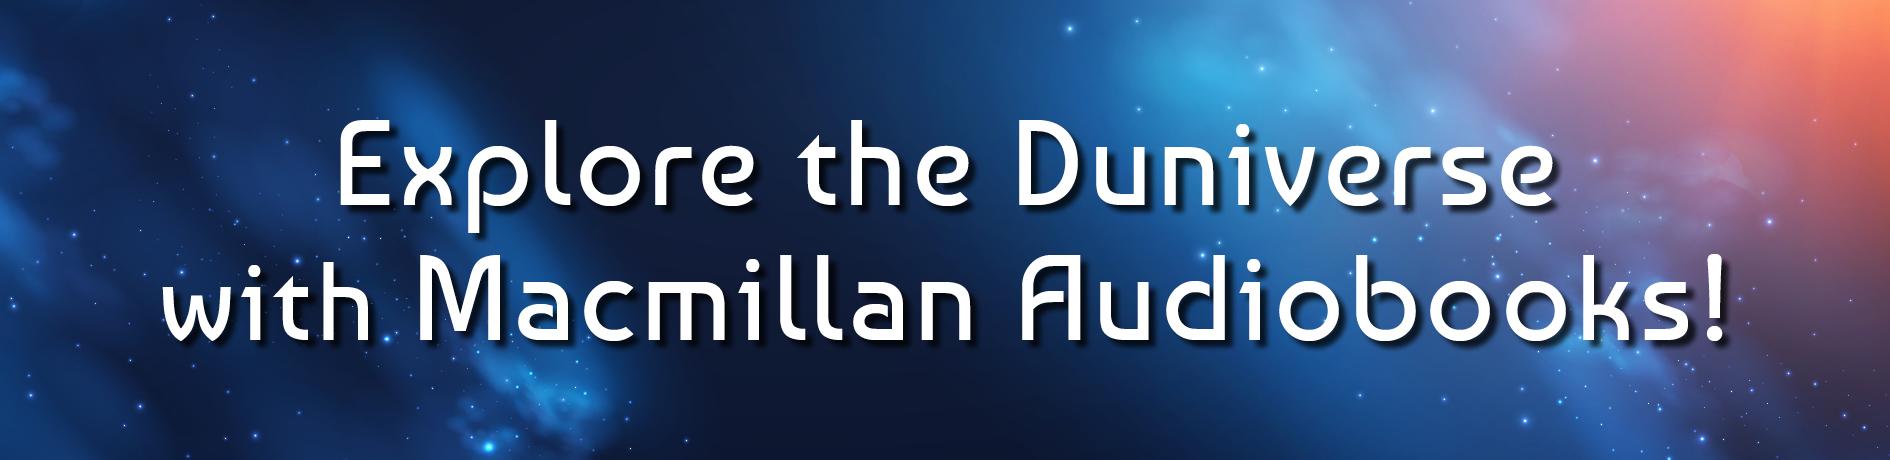 Dune site web banner 1